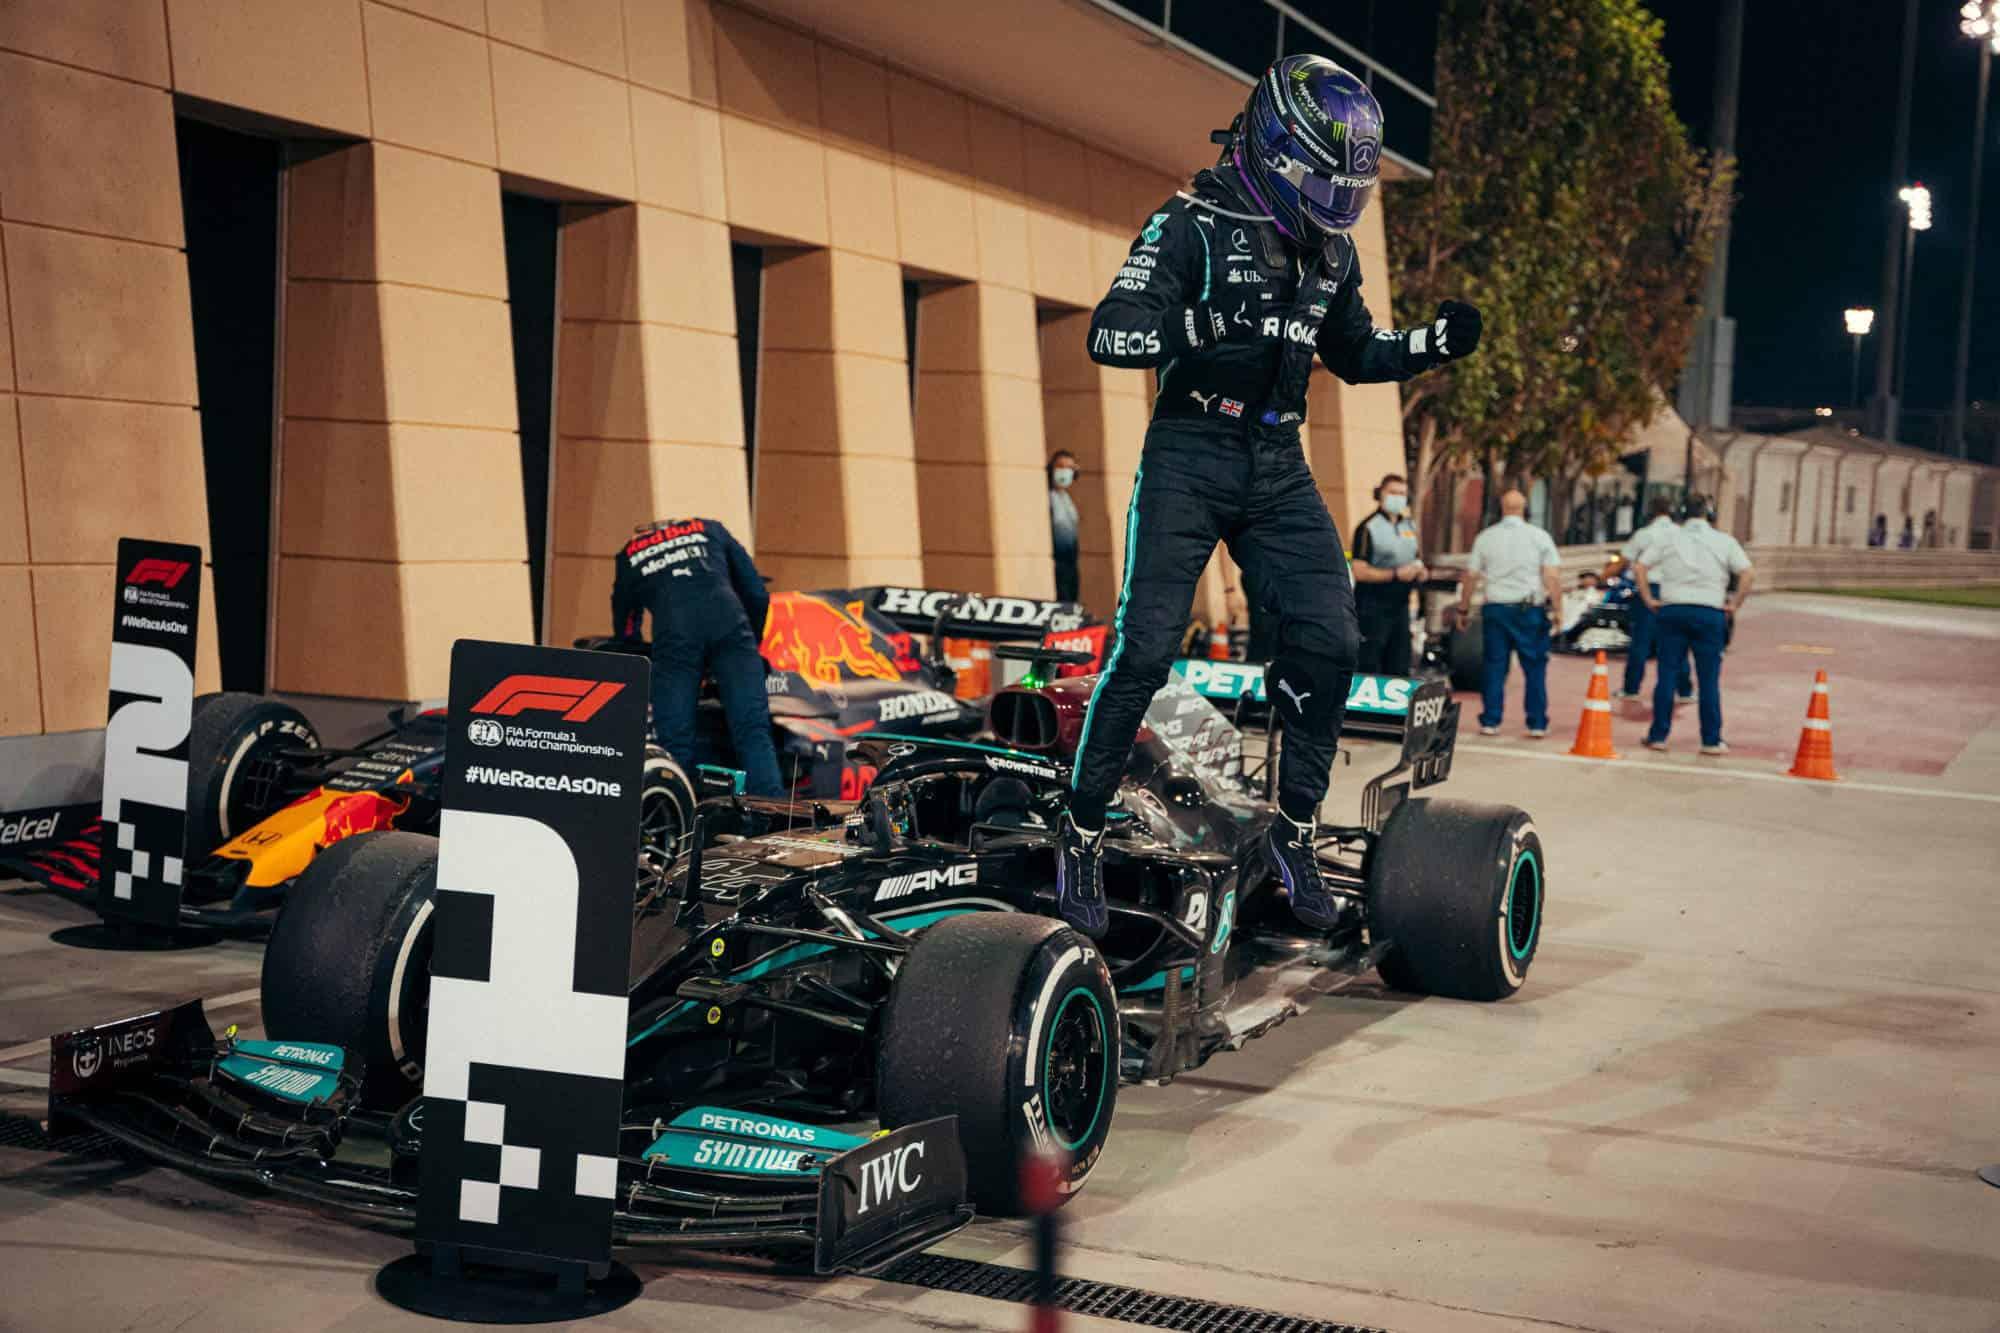 2021 Bahrain GP Hamilton Mercedes after the race out of the car jump Photo Daimler